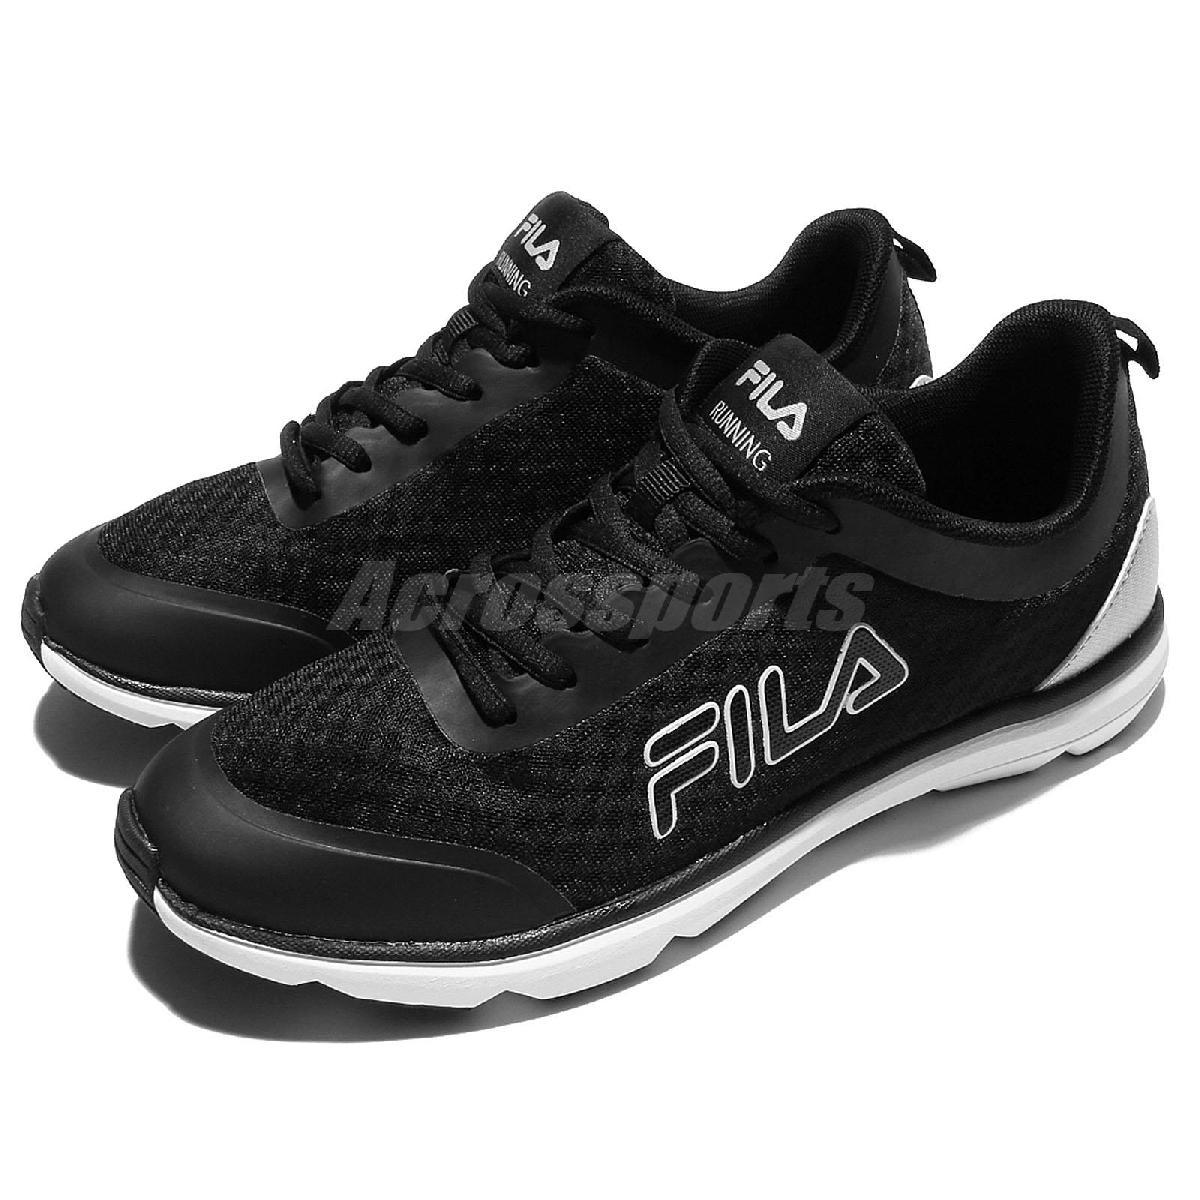 FILA 慢跑鞋 J319R 低筒 黑 白 運動鞋 輕量 基本款 男鞋【PUMP306】 1J319R041